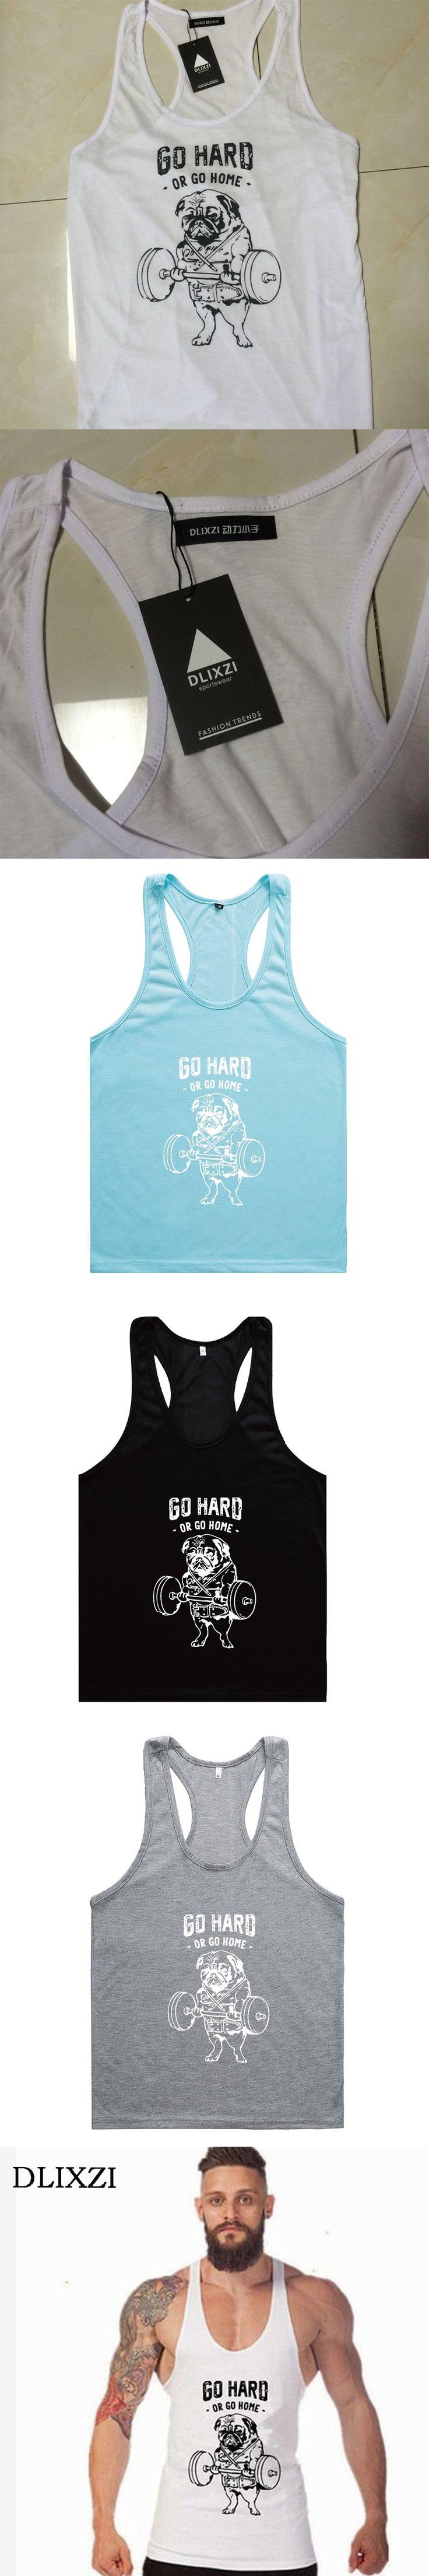 DLIXZI Brand Summer Bodybuilding Tank Tops Sleeveless Fitness Workout Muscle Shirt Fashion Dog Print Funny 3D T-shirt Vest